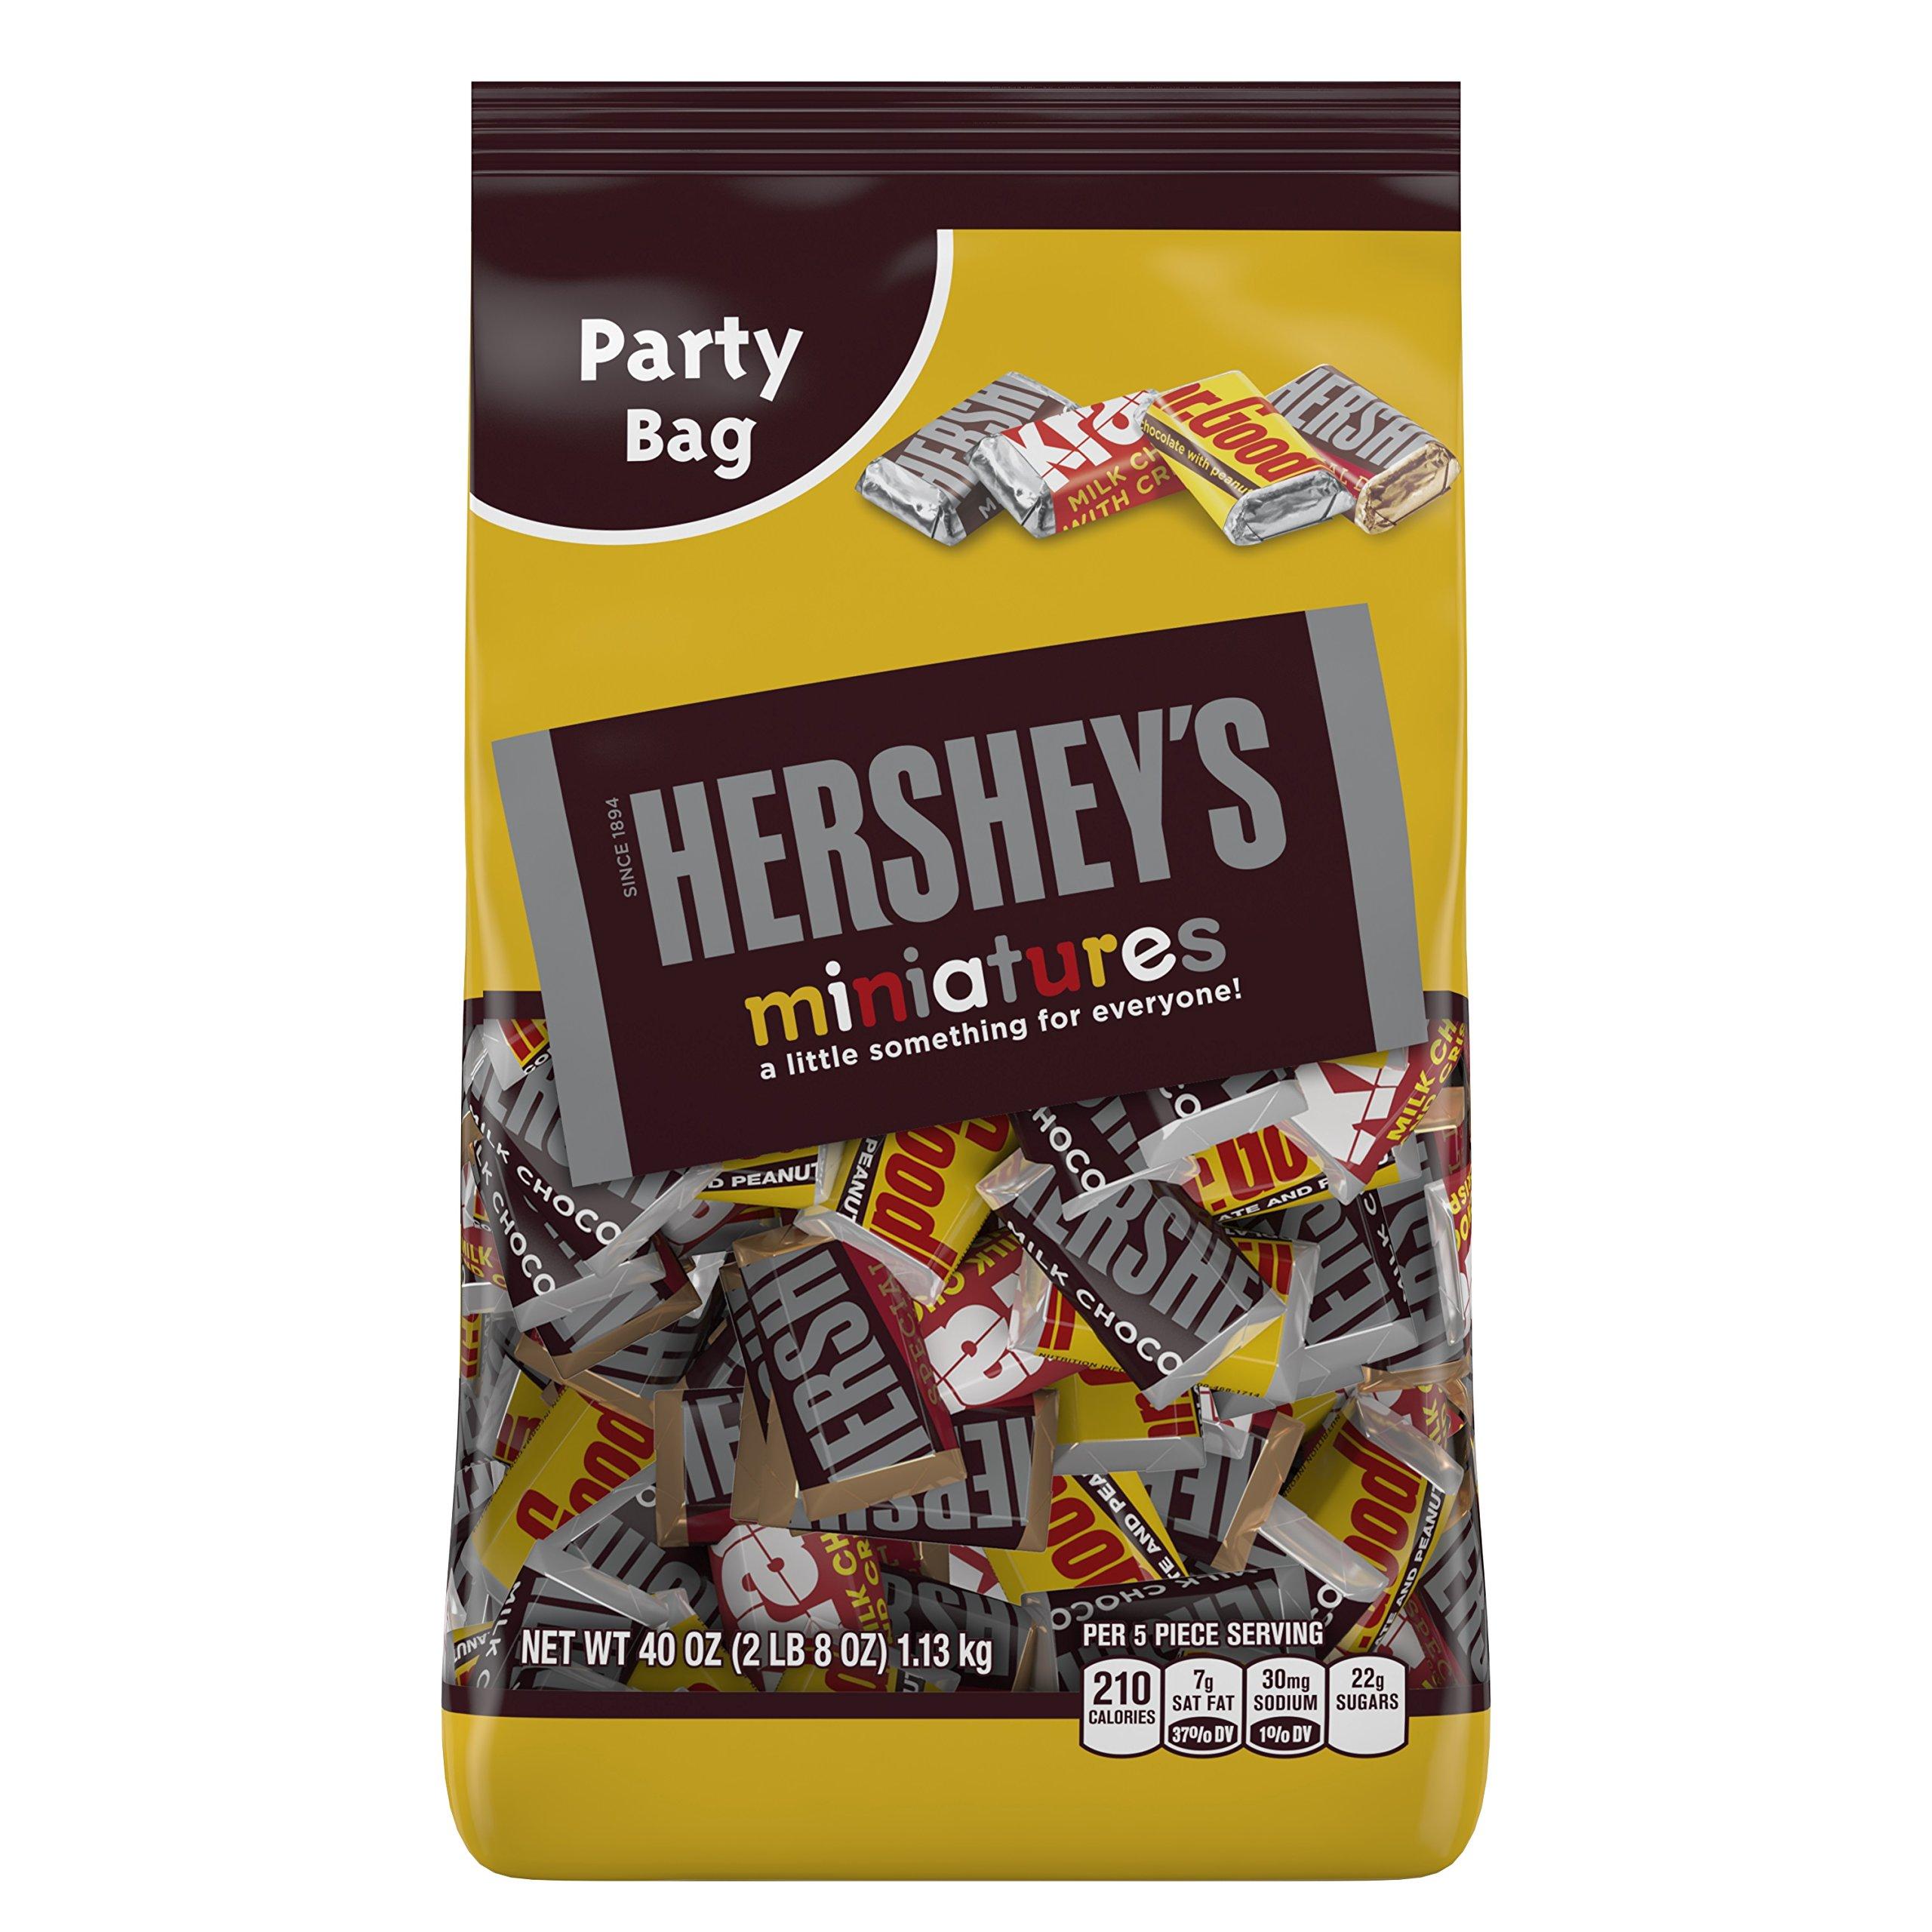 HERSHEY'S Chocolate Candy Bar Assortment, Miniatures (Hershey's, Krackel, Mr Goodbar, Special Dark), 40 Ounce Bulk Candy